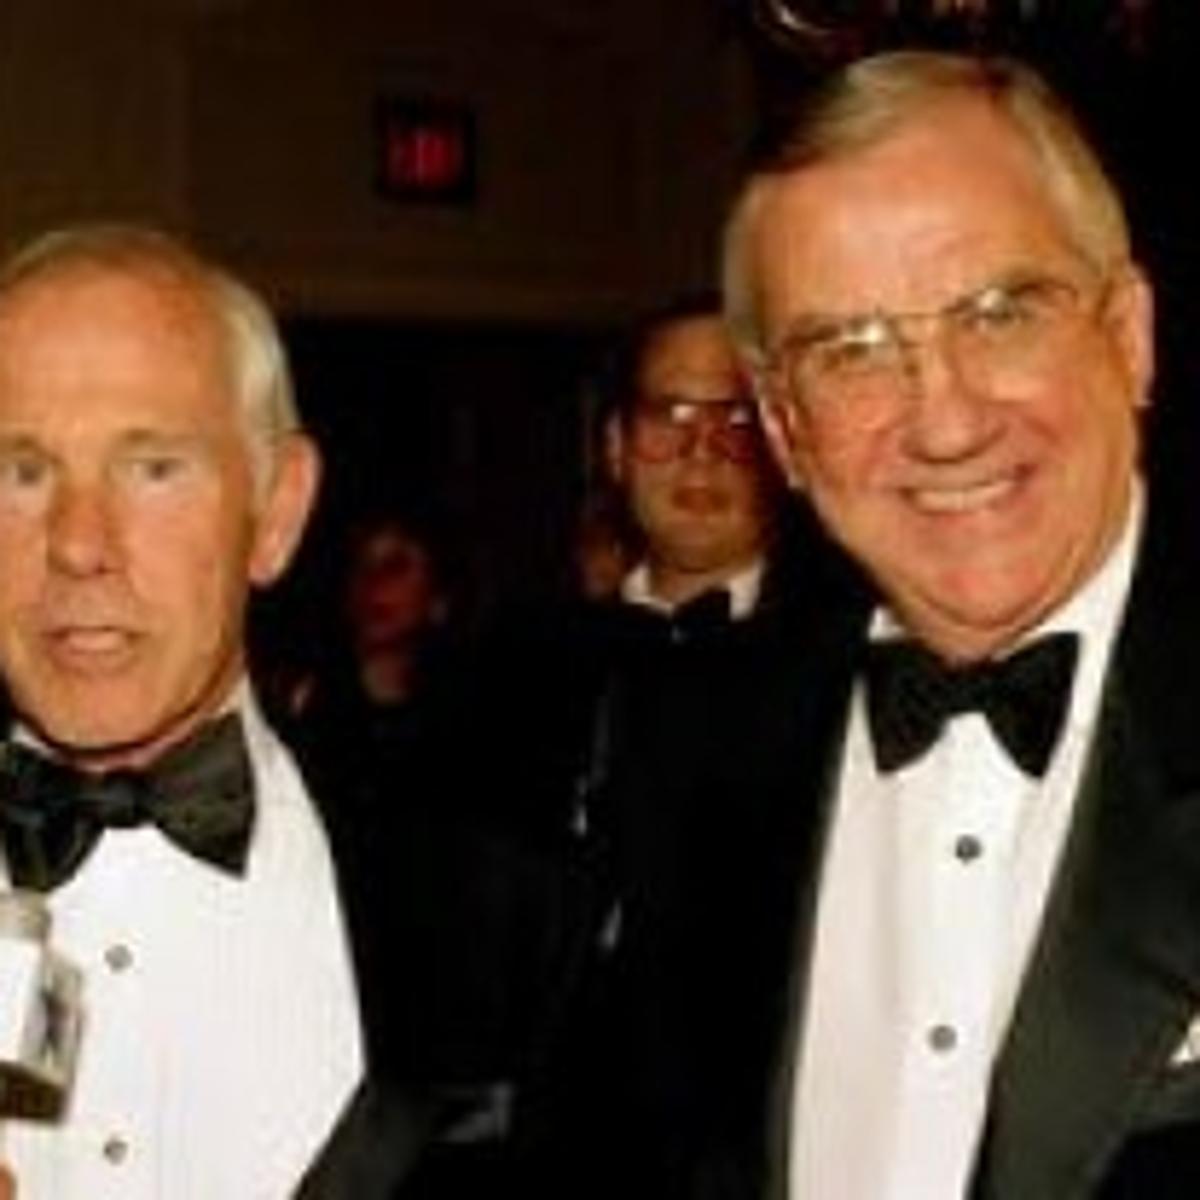 Ed McMahon dies at age 86 | Lifestyles | pressofatlanticcity com